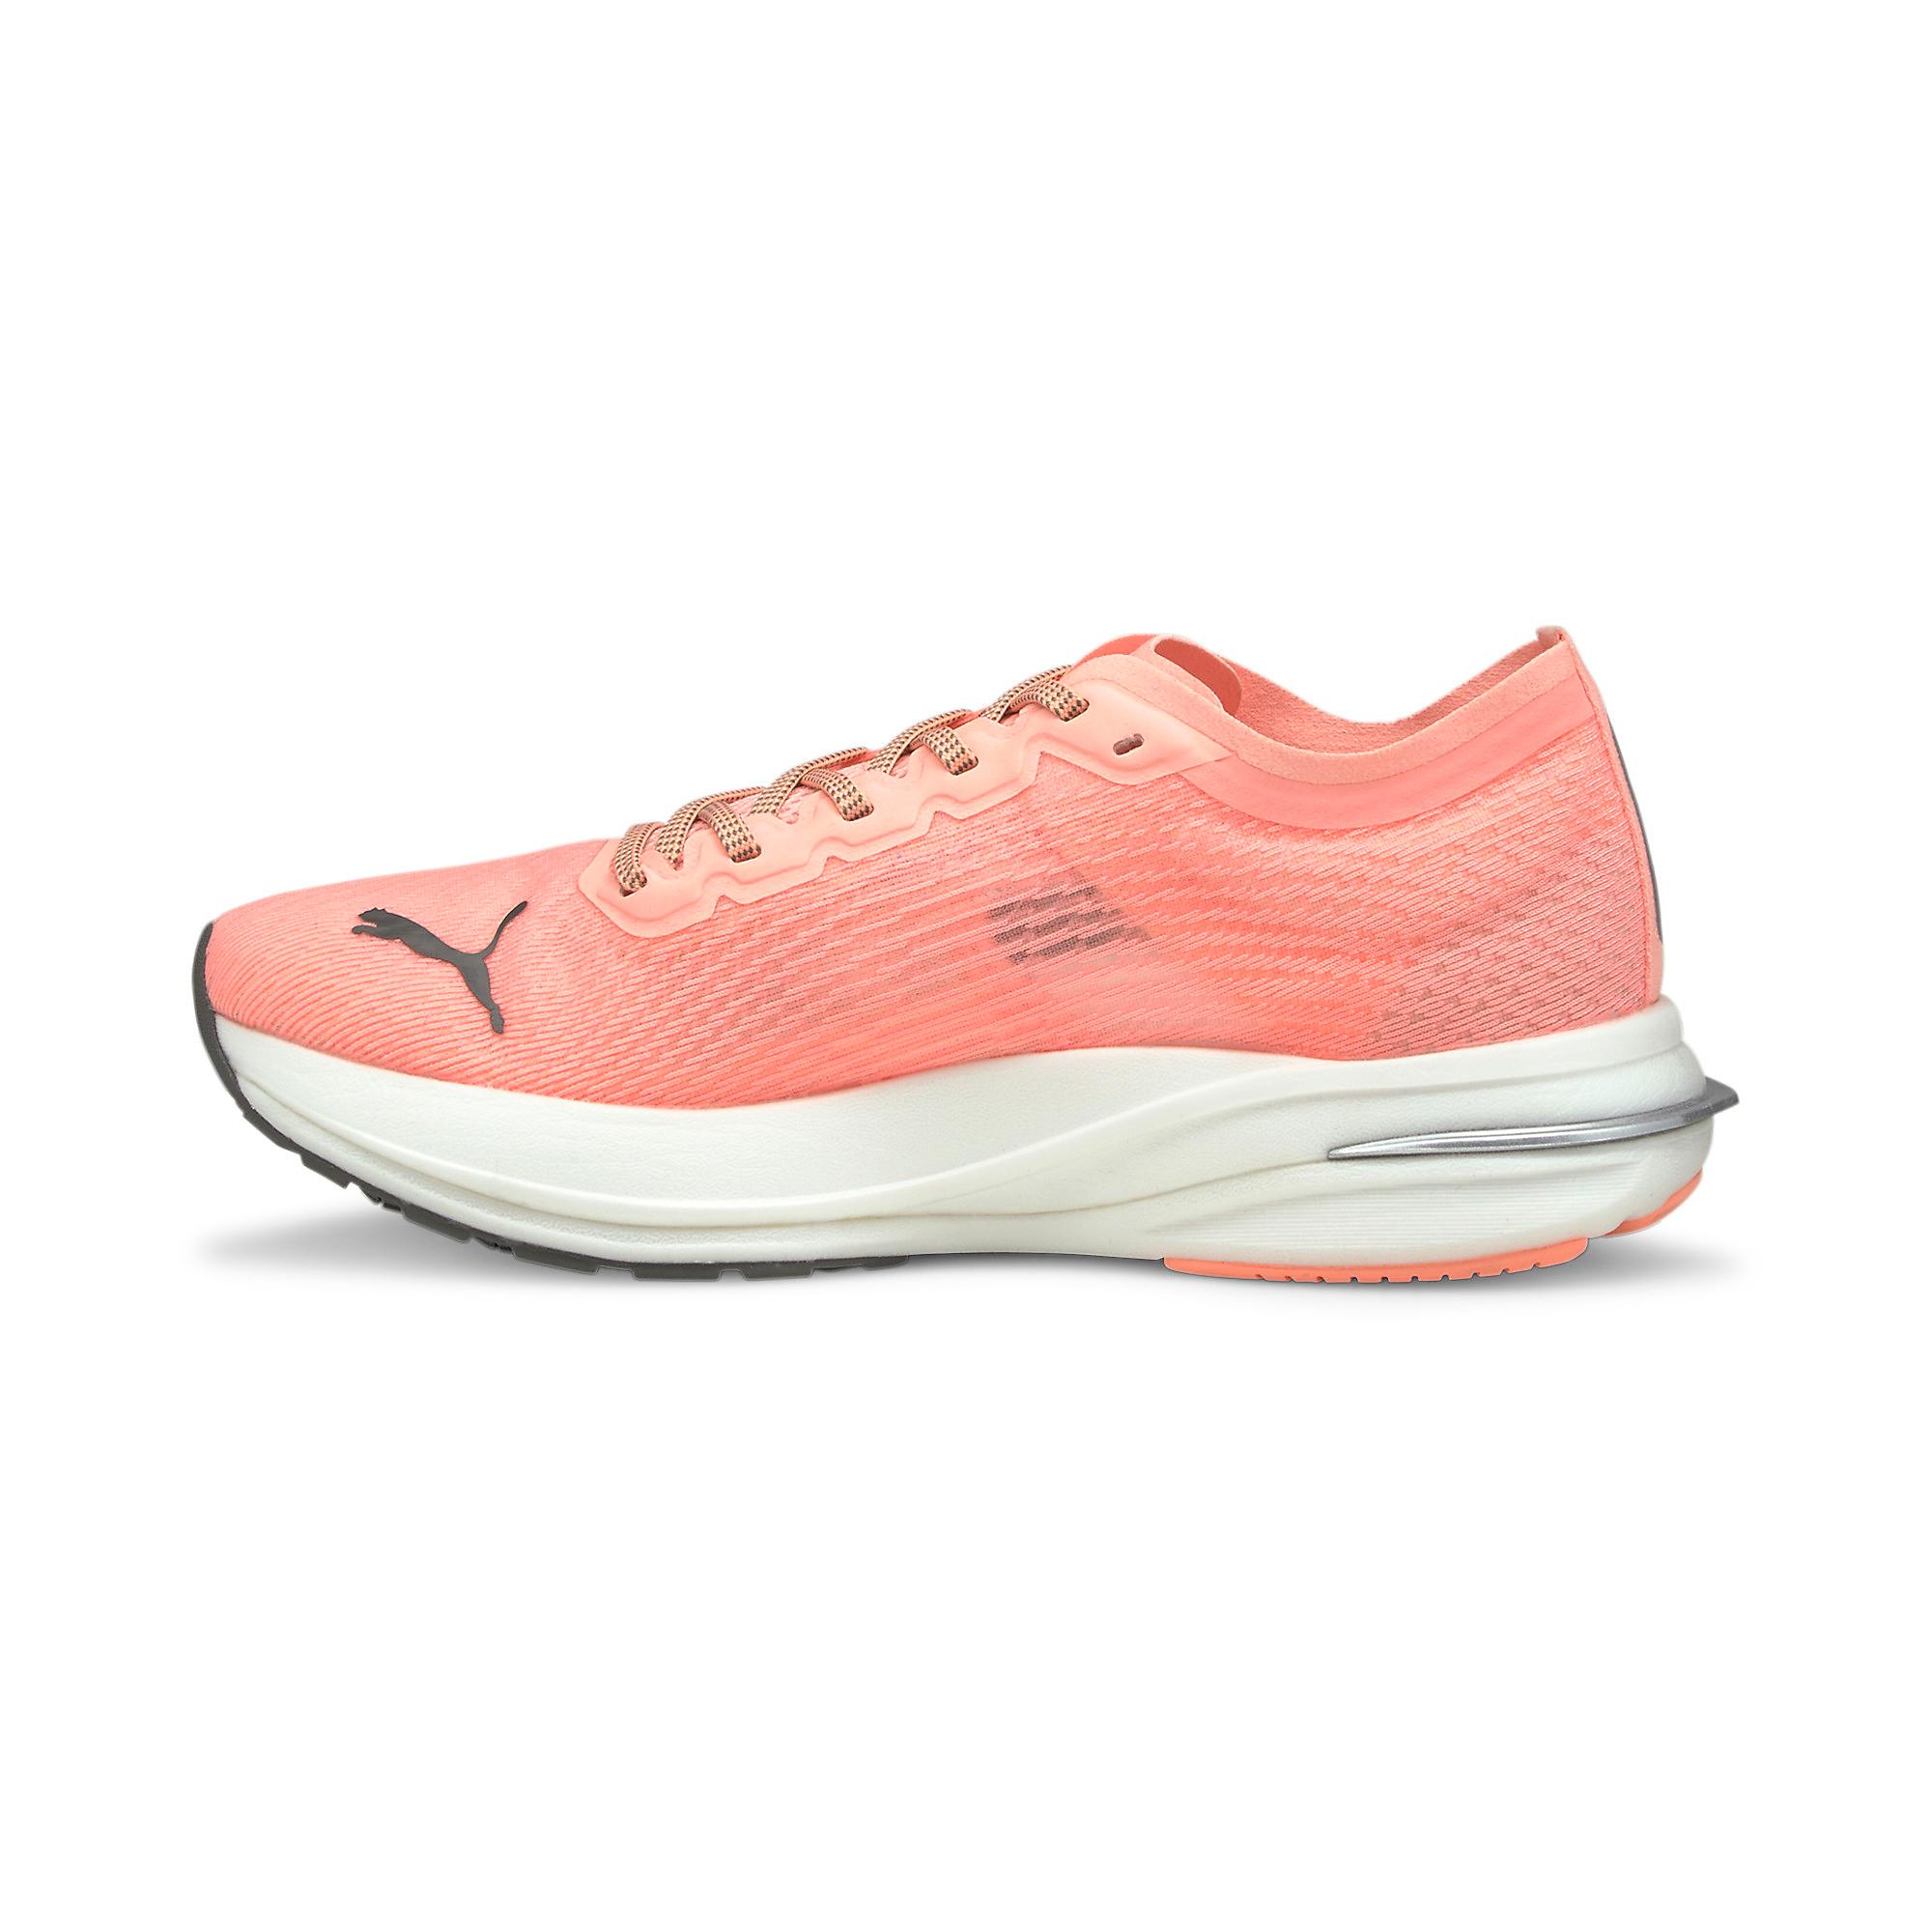 Women's Puma Deviate Nitro Running Shoe - Color: Elektro Peach - Size: 5.5 - Width: Regular, Elektro Peach, large, image 2